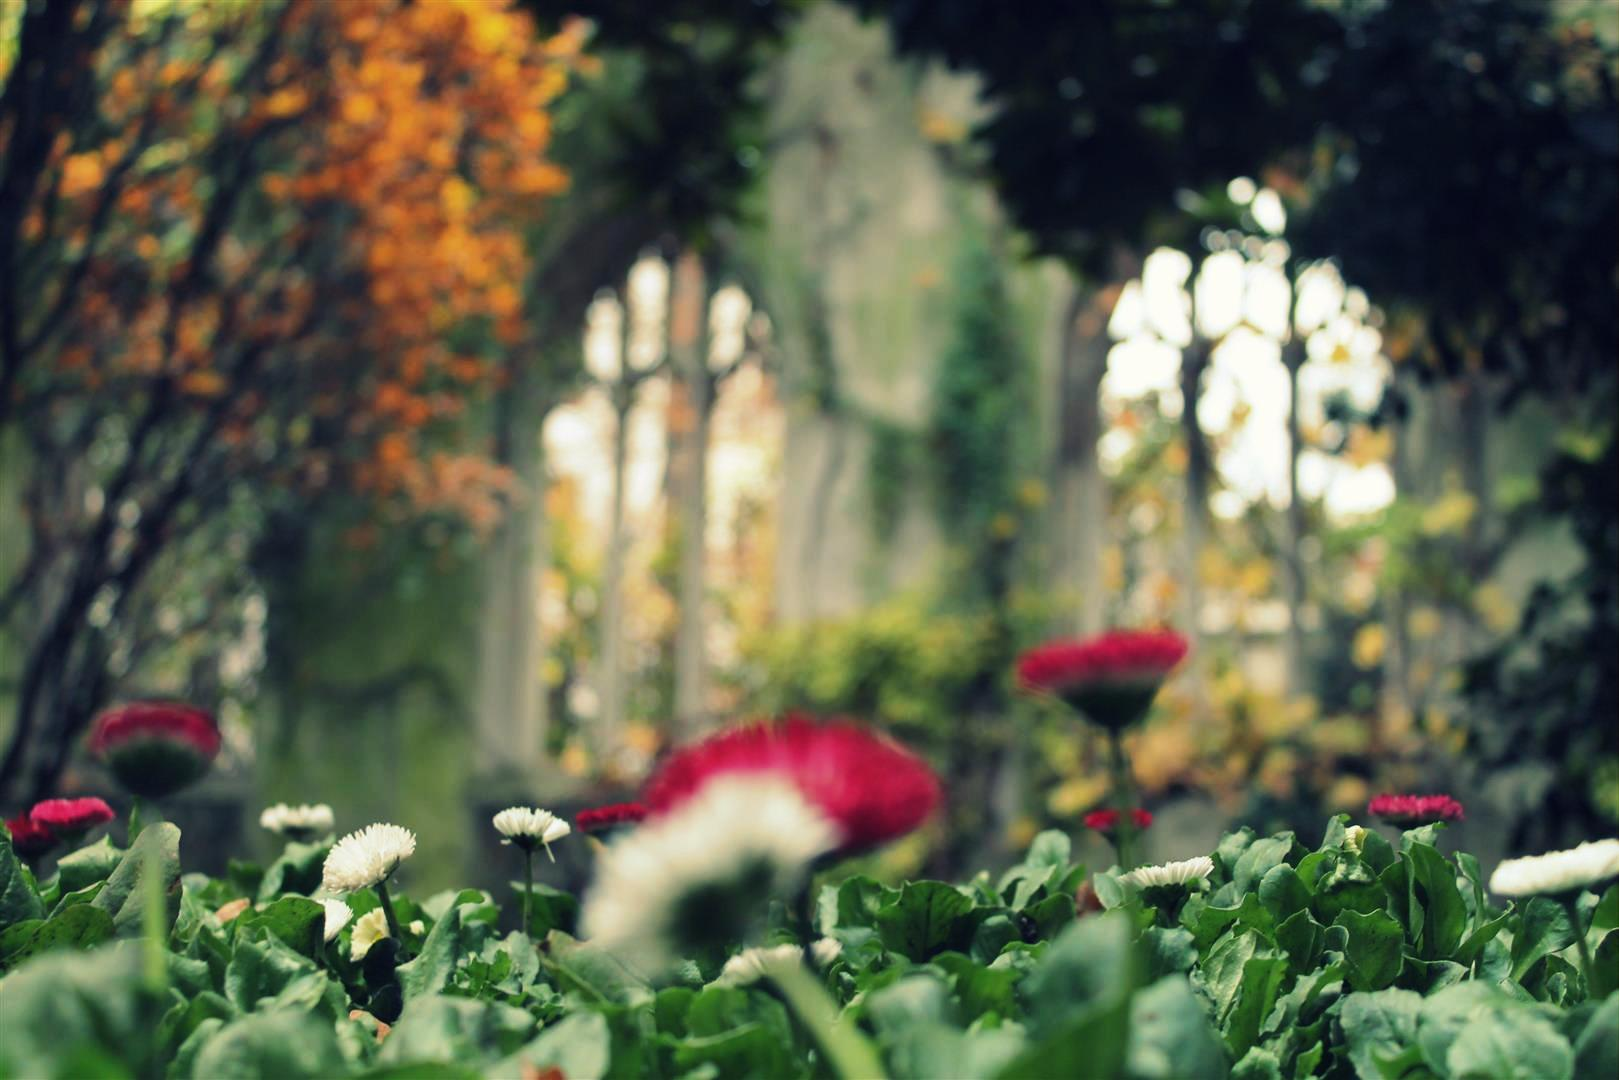 Secret Gardens - Explore the city's beautiful hidden gardens